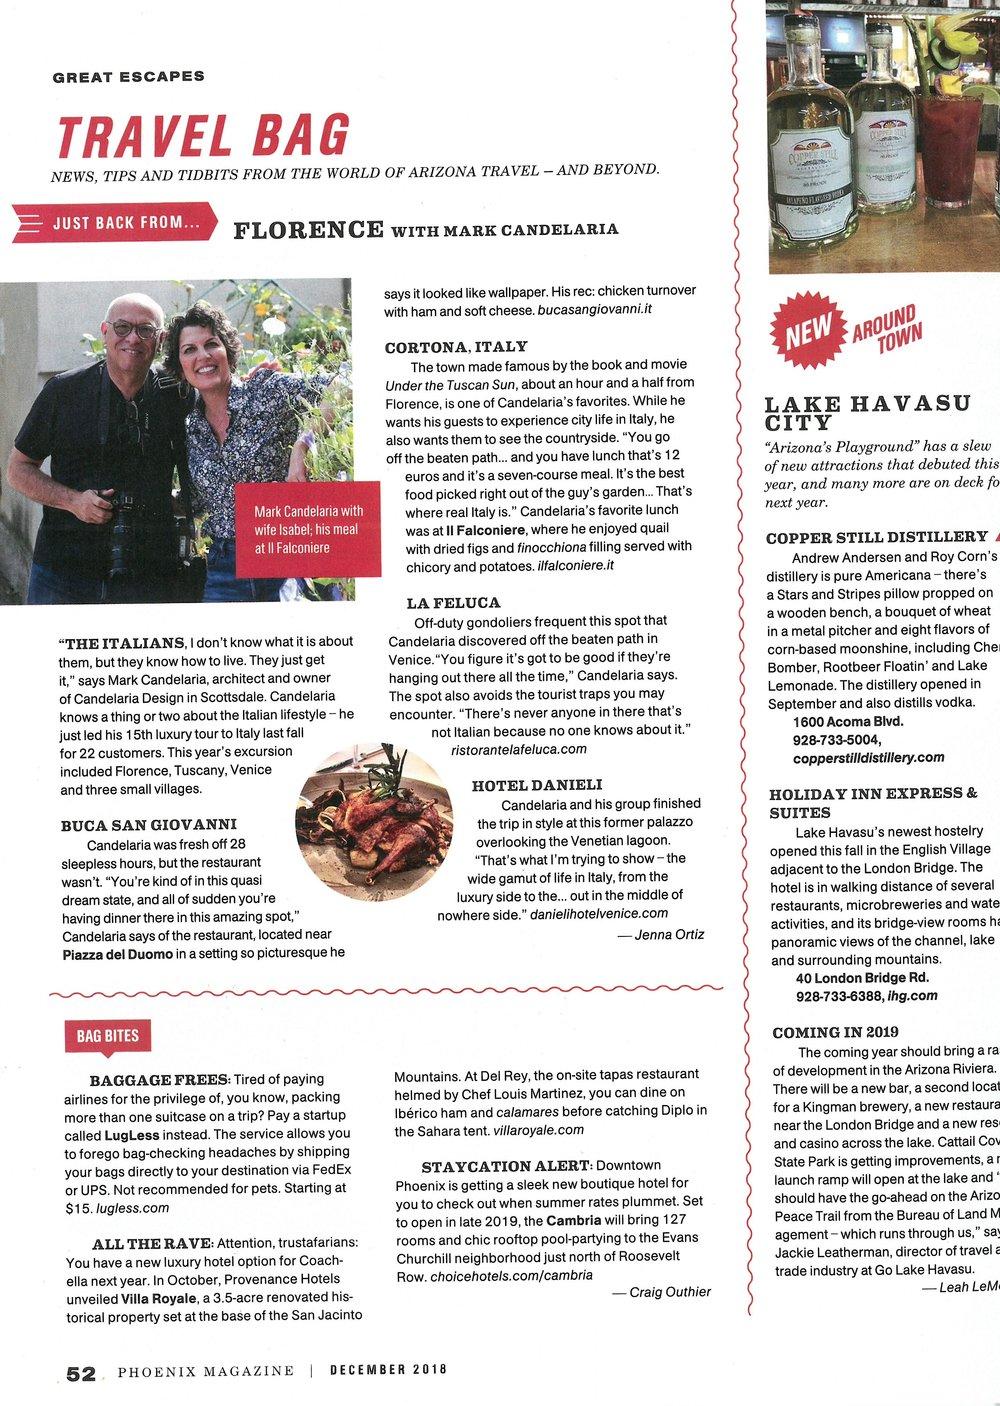 Candelaria Tour Italy. Phoenix Magazine 2018.jpg